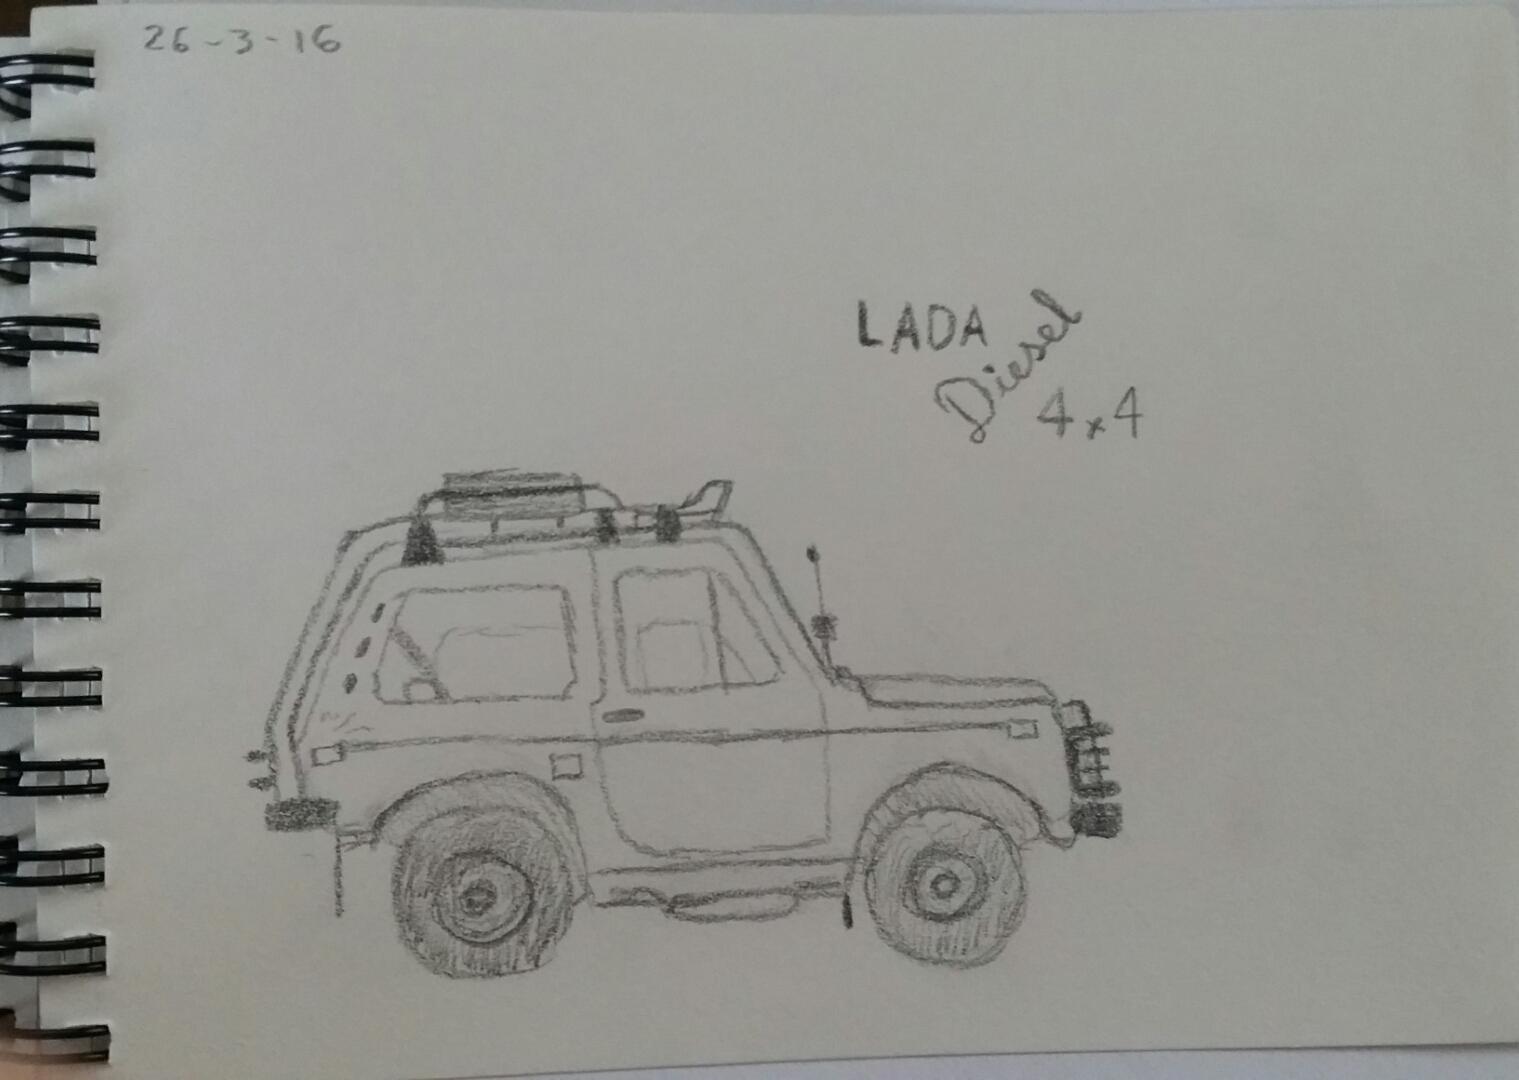 26/3/2016 Lada Niva